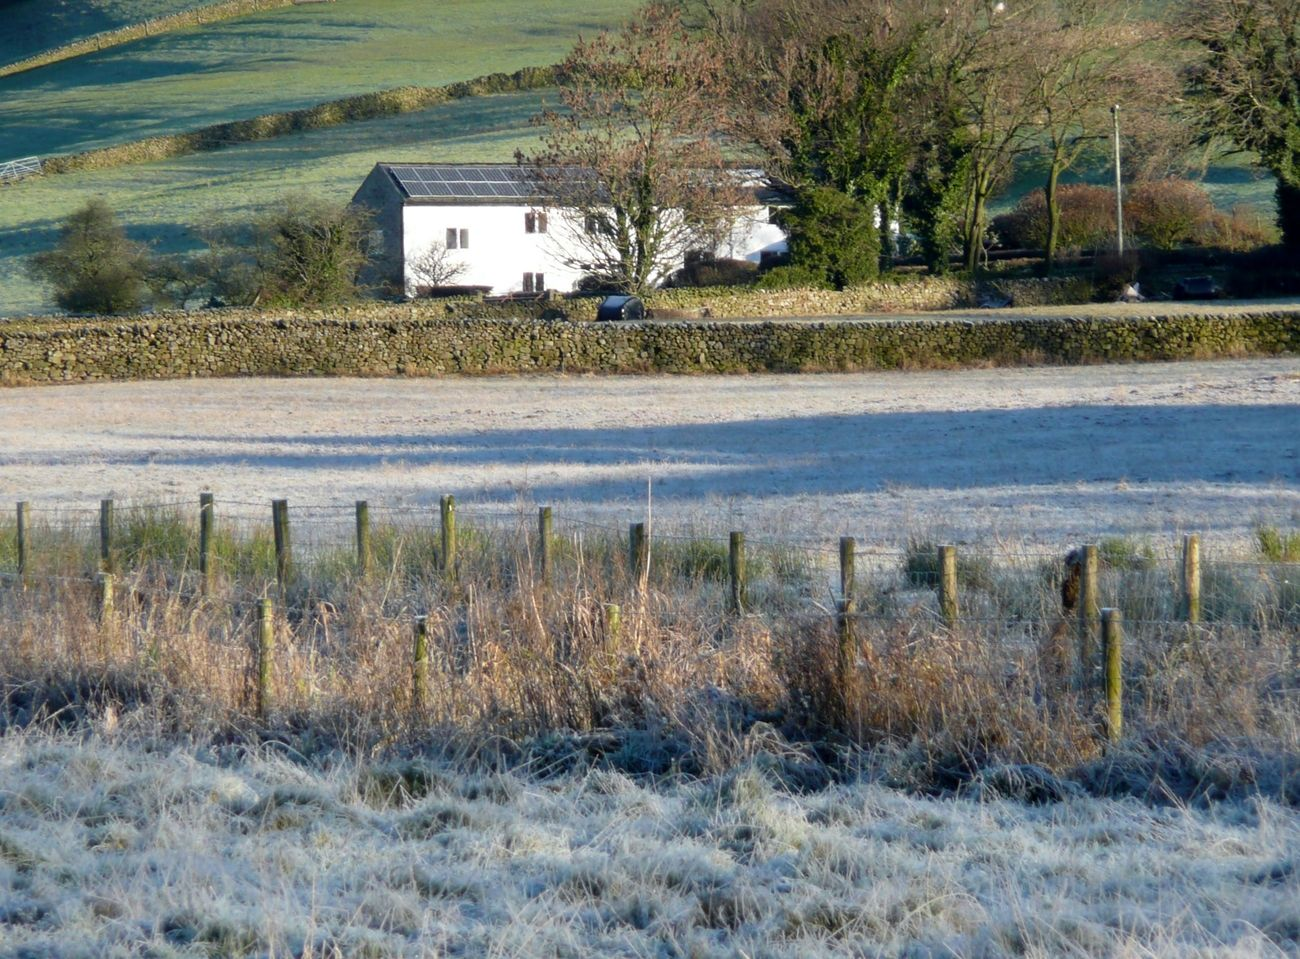 Frost on the fields.